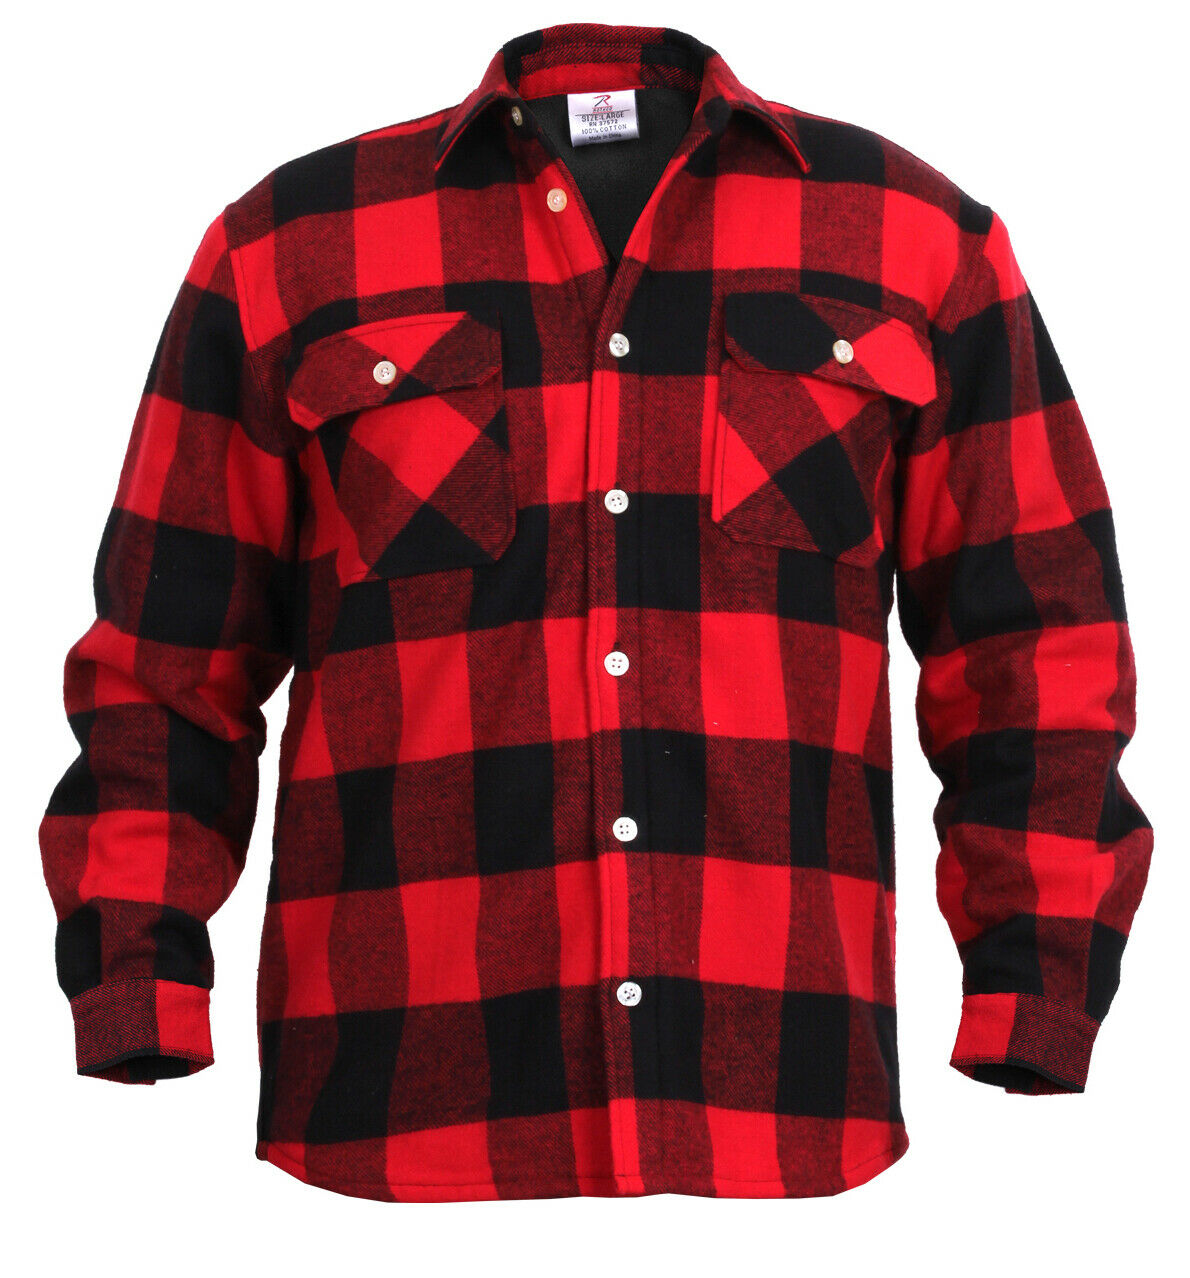 Mens brawny buffalo plaid flannel shirt red long sleeve fleece lined redhco 2739